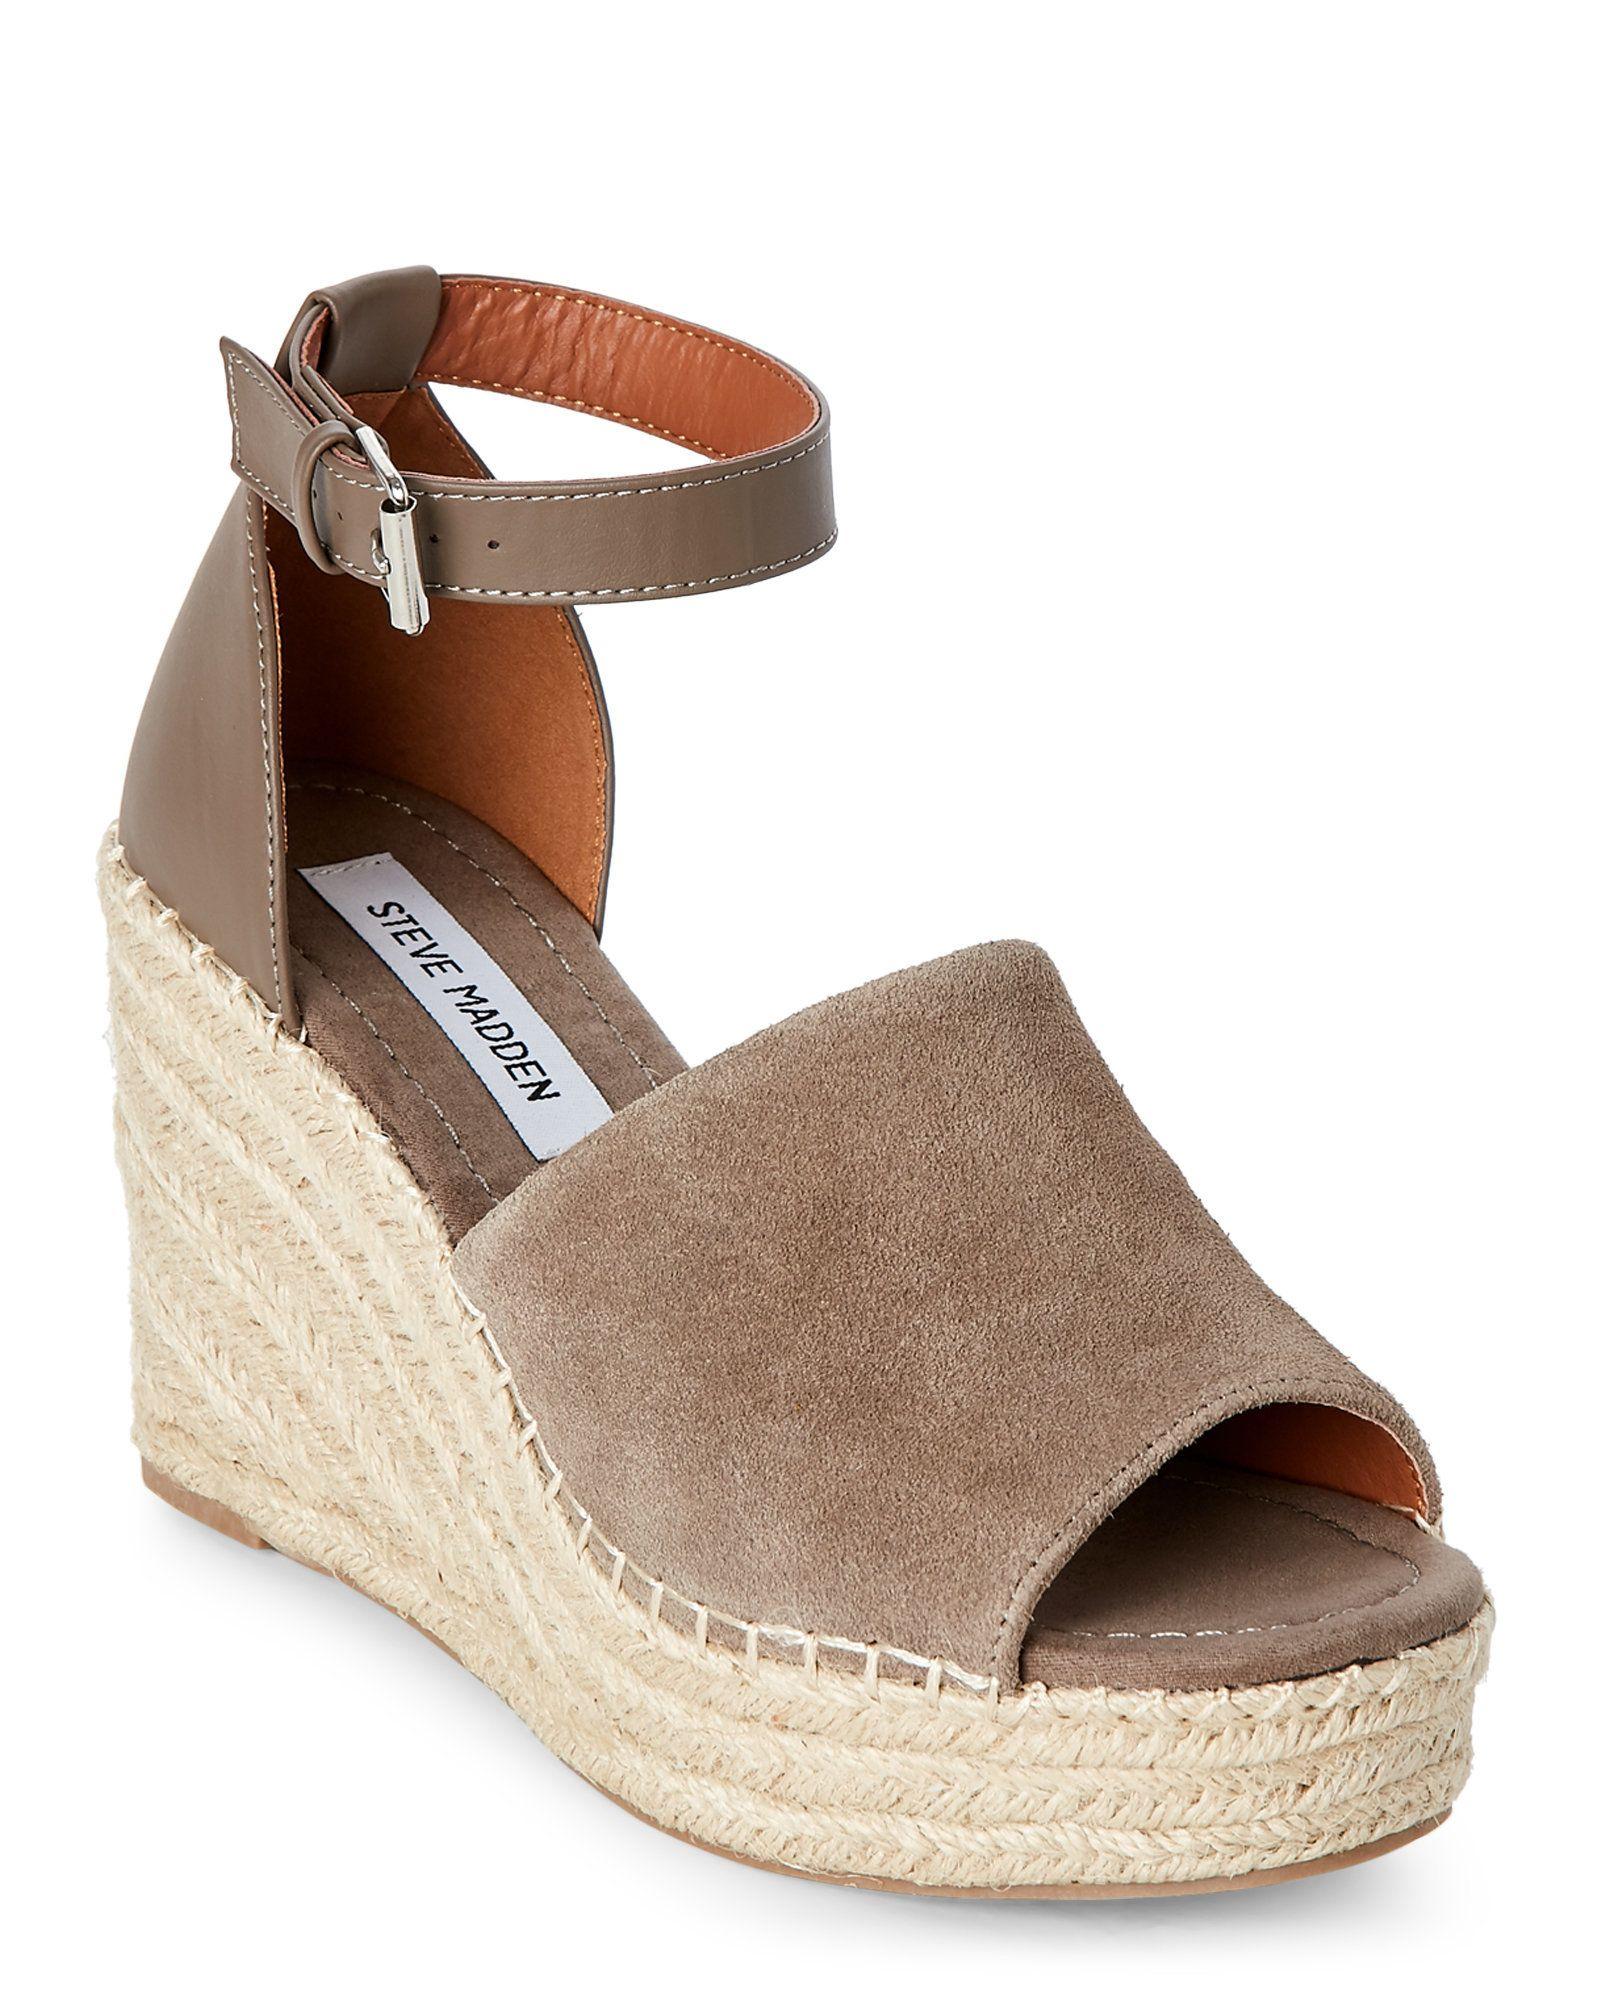 479e346074b Taupe Jaylen Platform Wedge Espadrille Sandals in 2019 | shoes ...